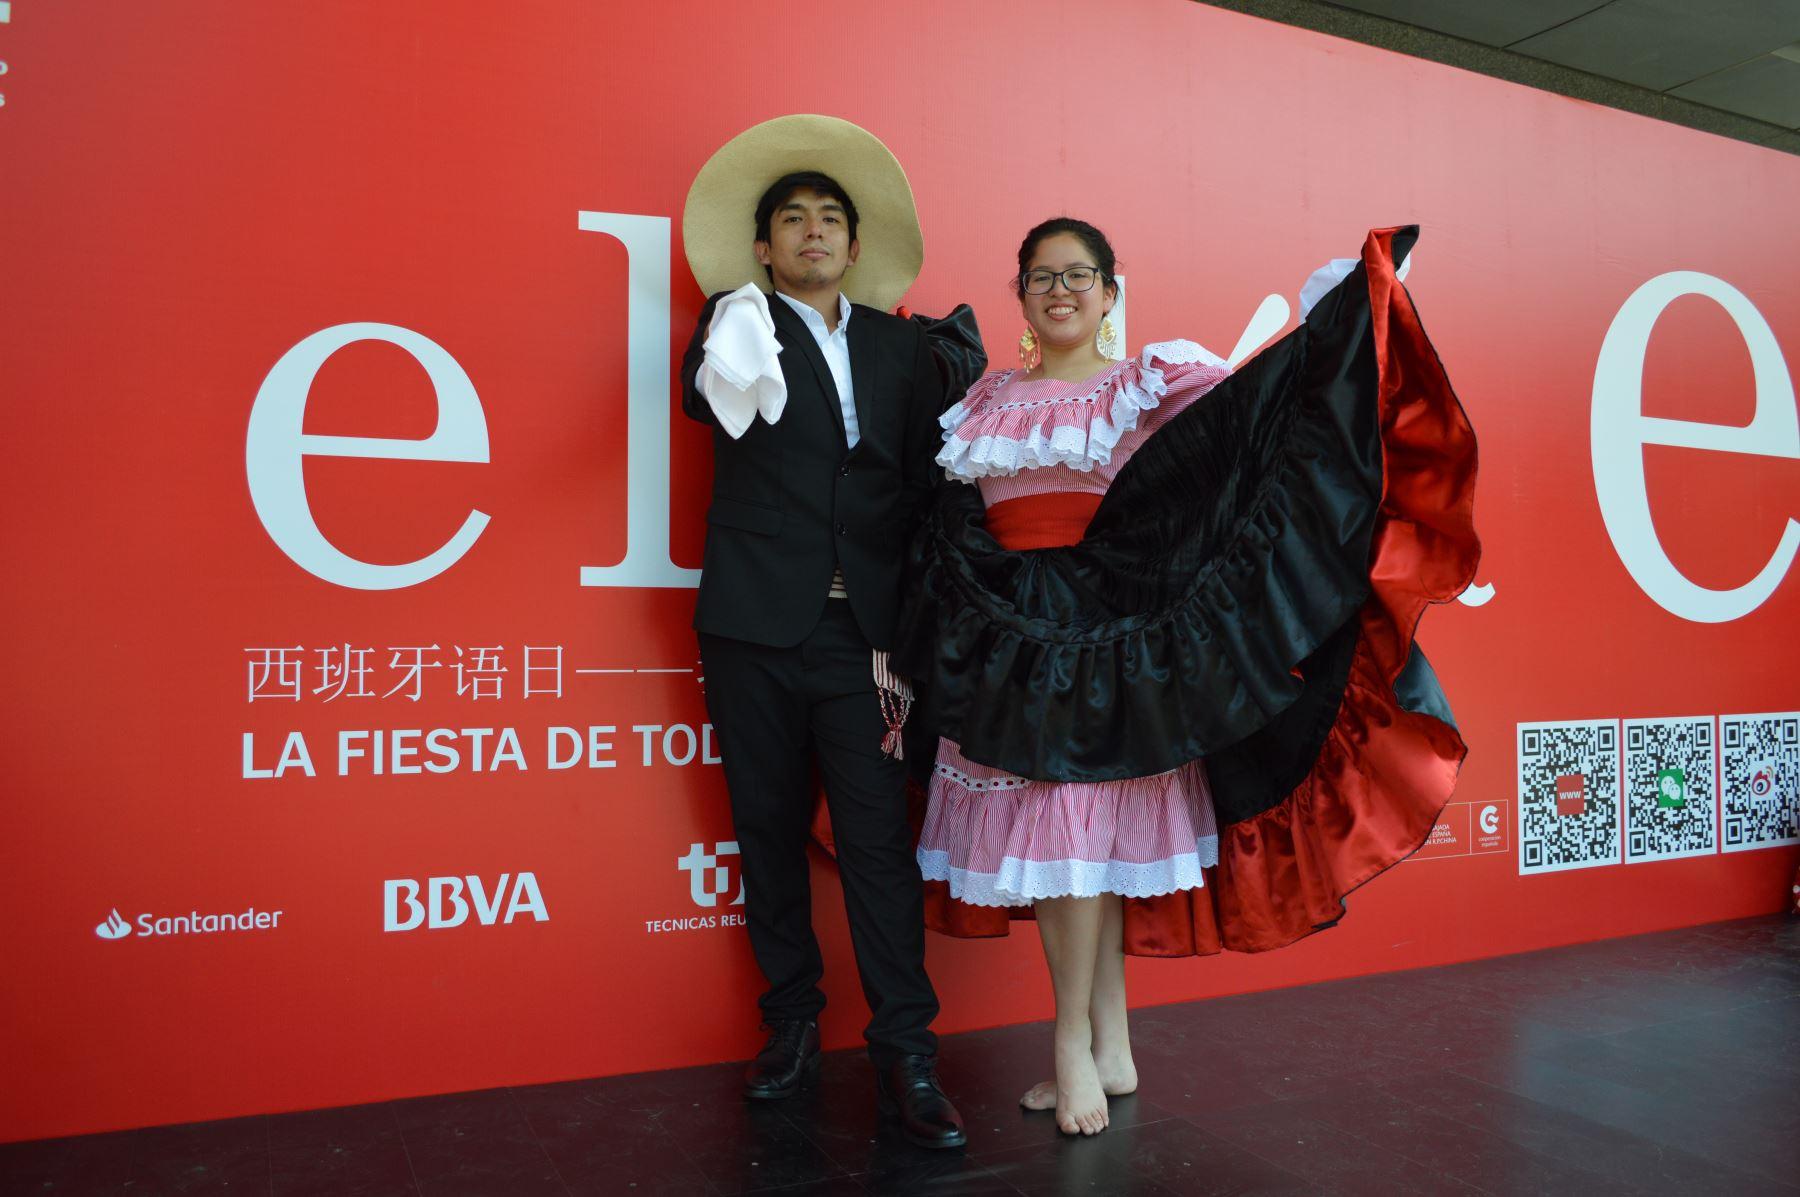 Marinera norteña representada por estudiantes peruanos becados en China. Foto: ANDINA/ Víctor Véliz.